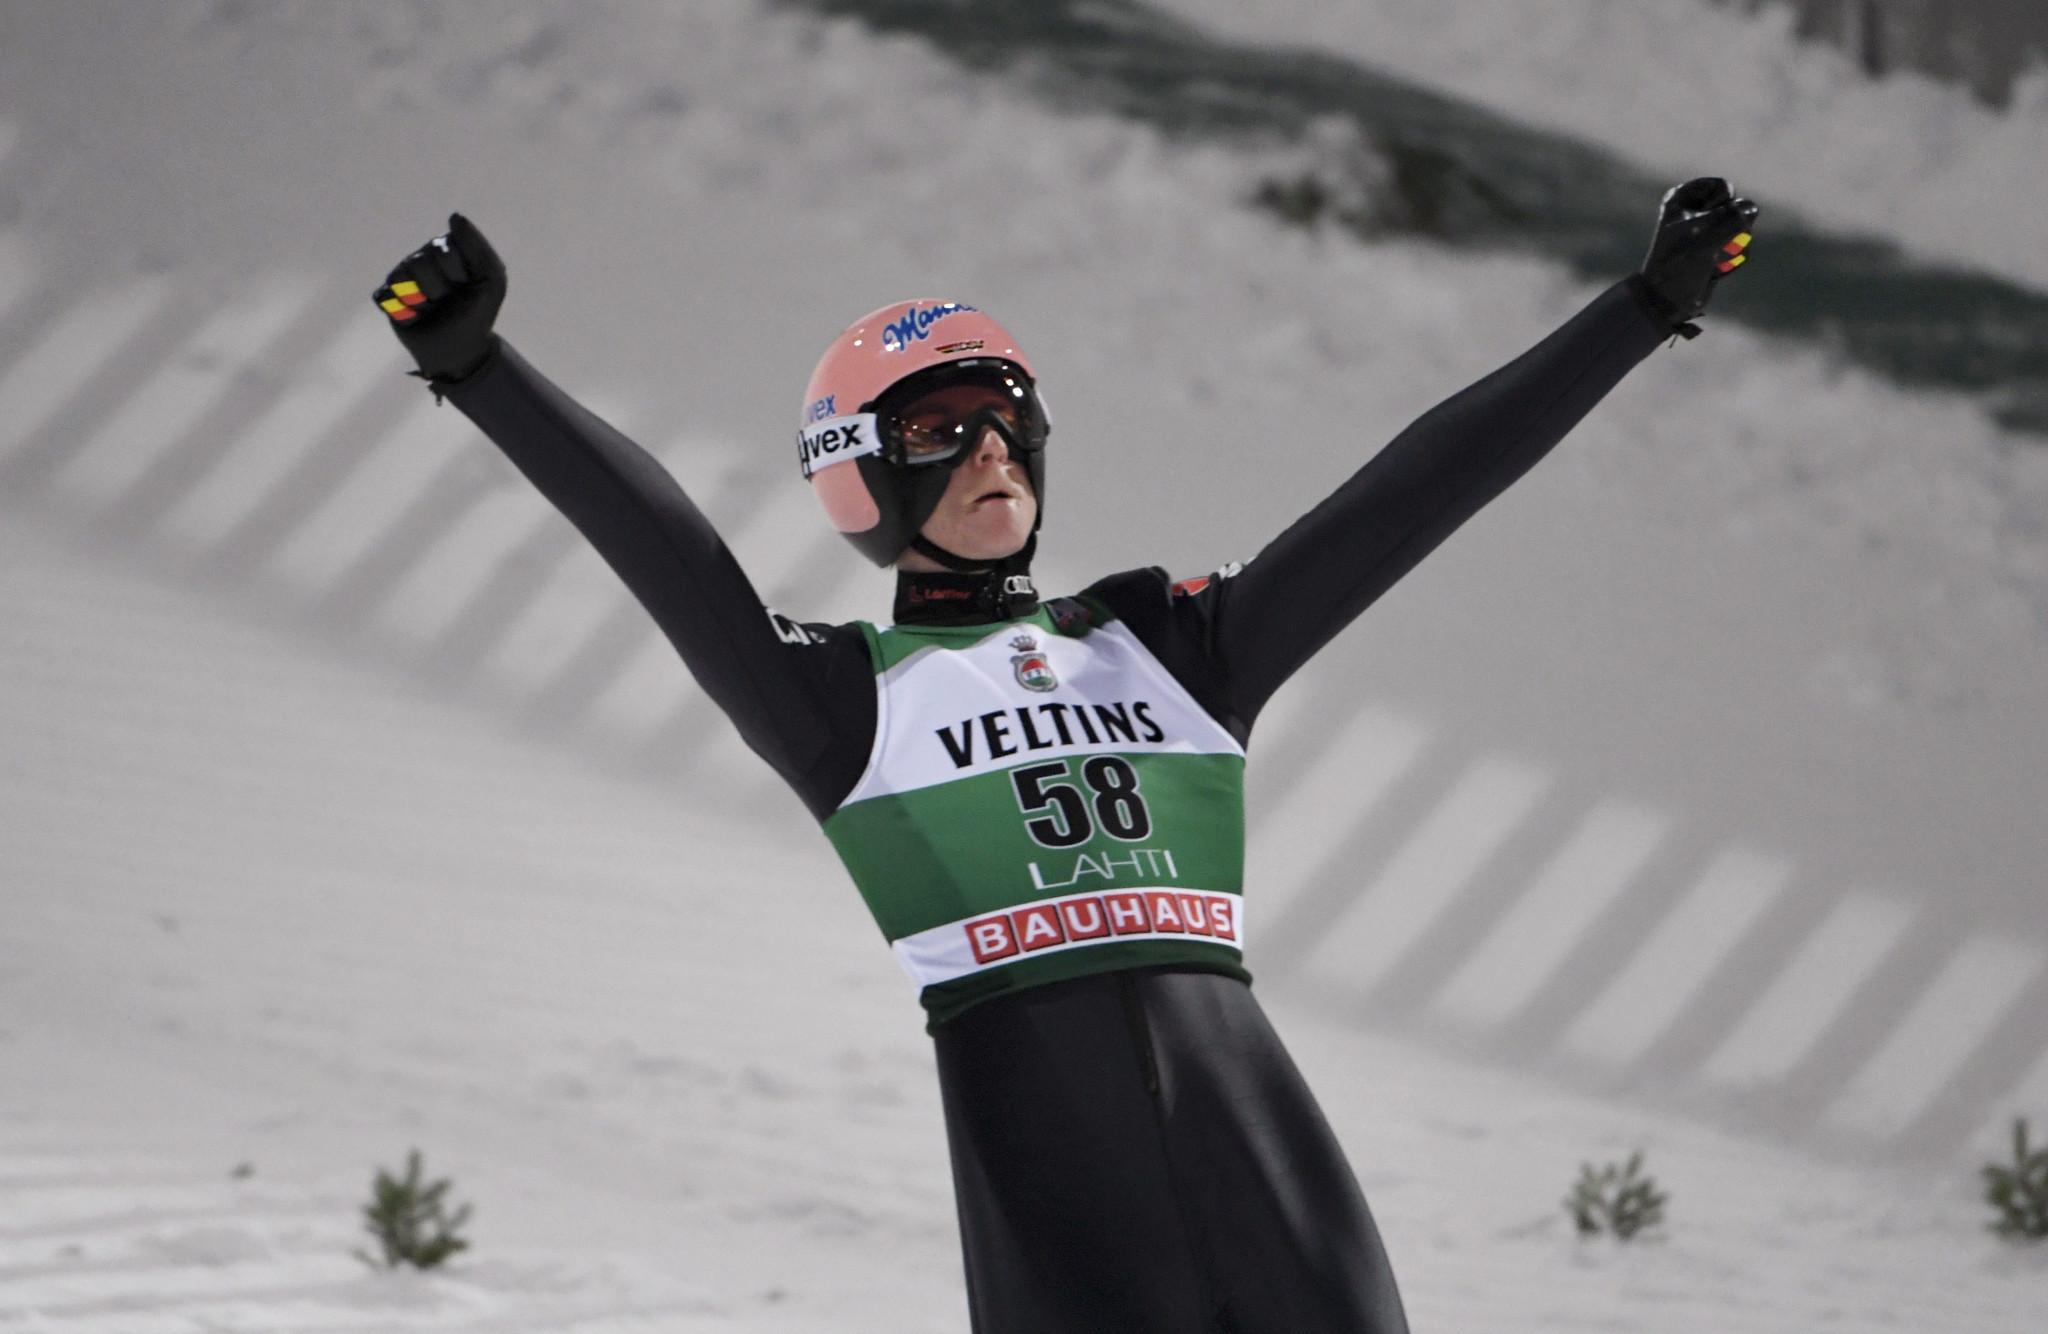 Geiger closes gap on Kraft at FIS Ski Jumping World Cup in Lahti